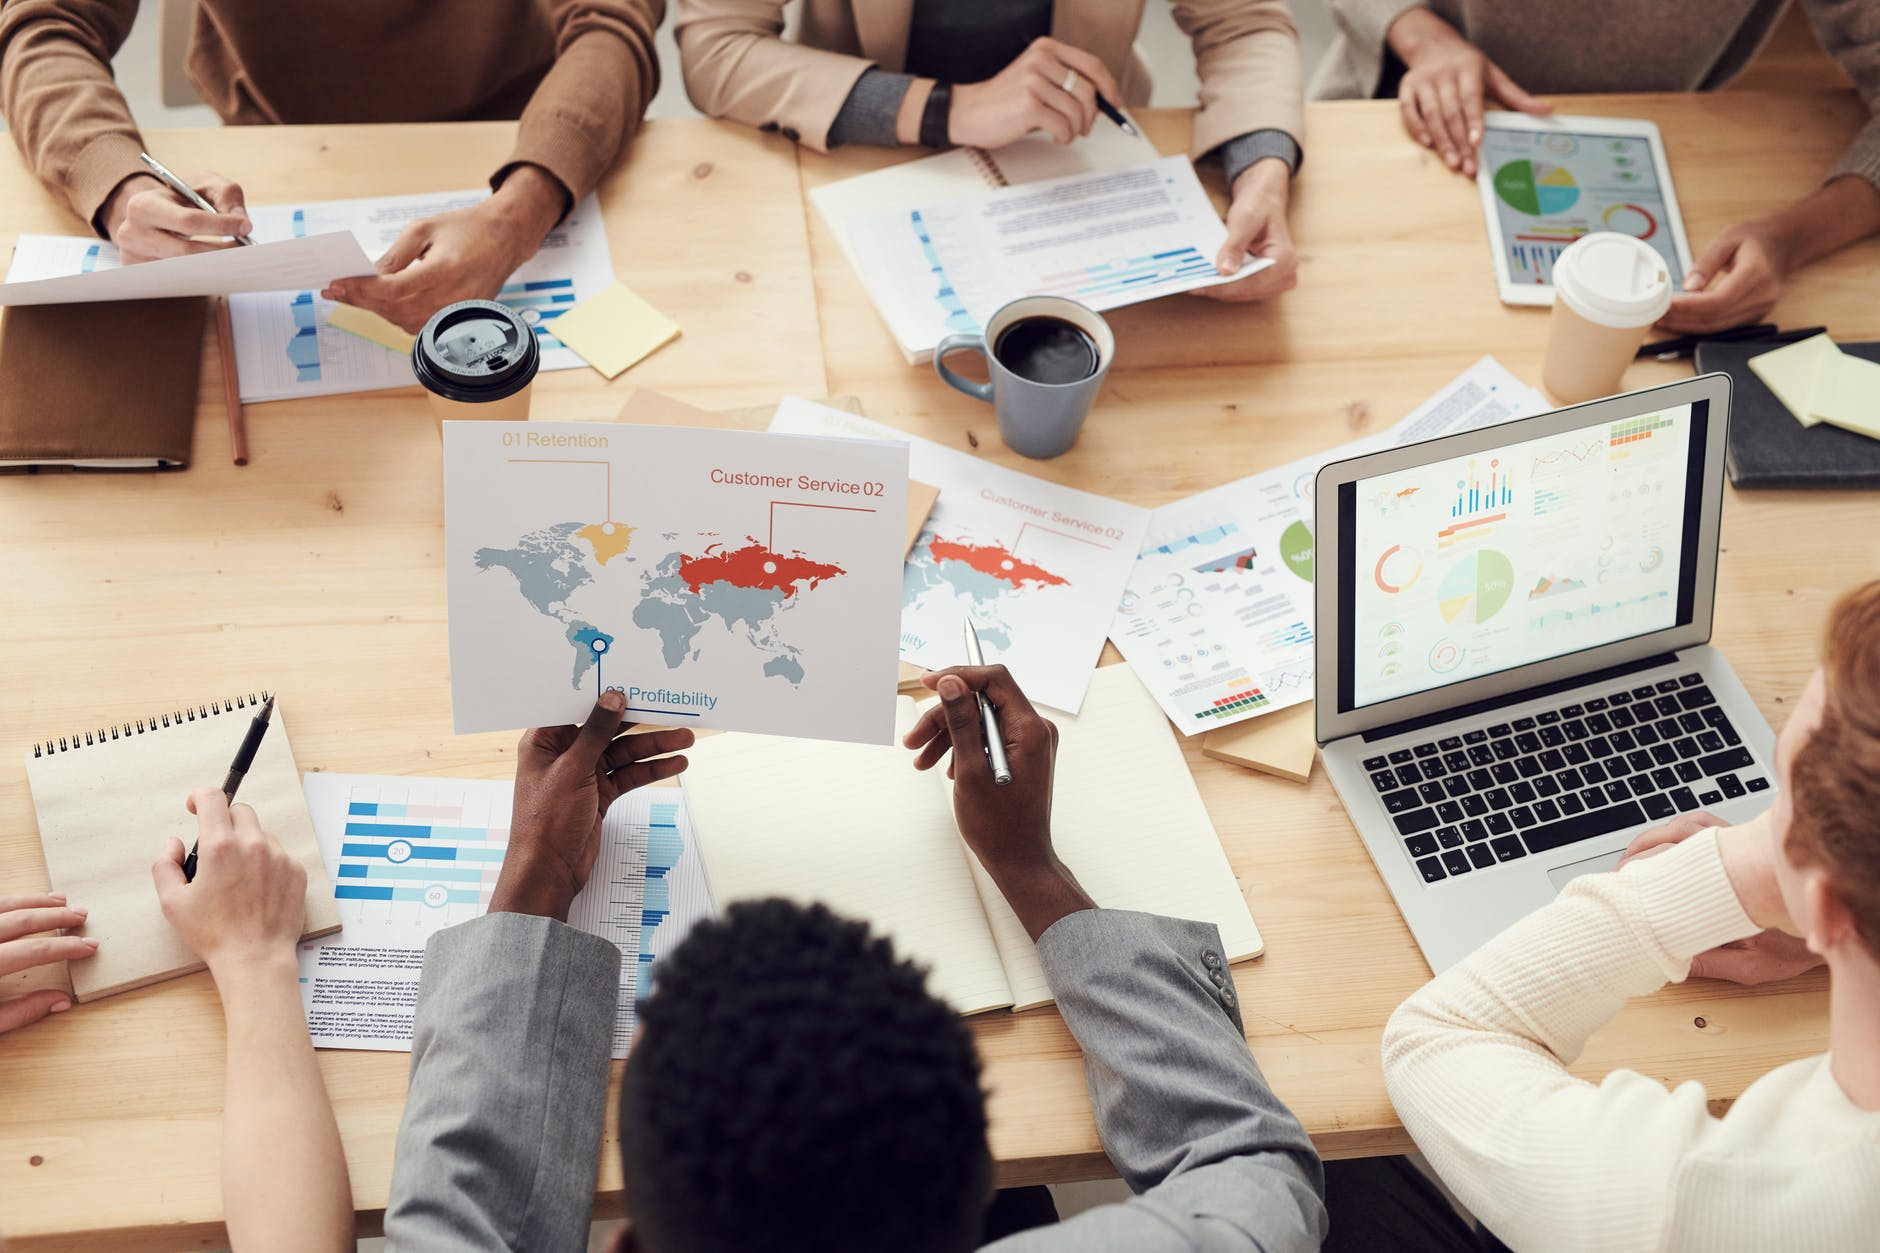 100 Ways to Market your Company